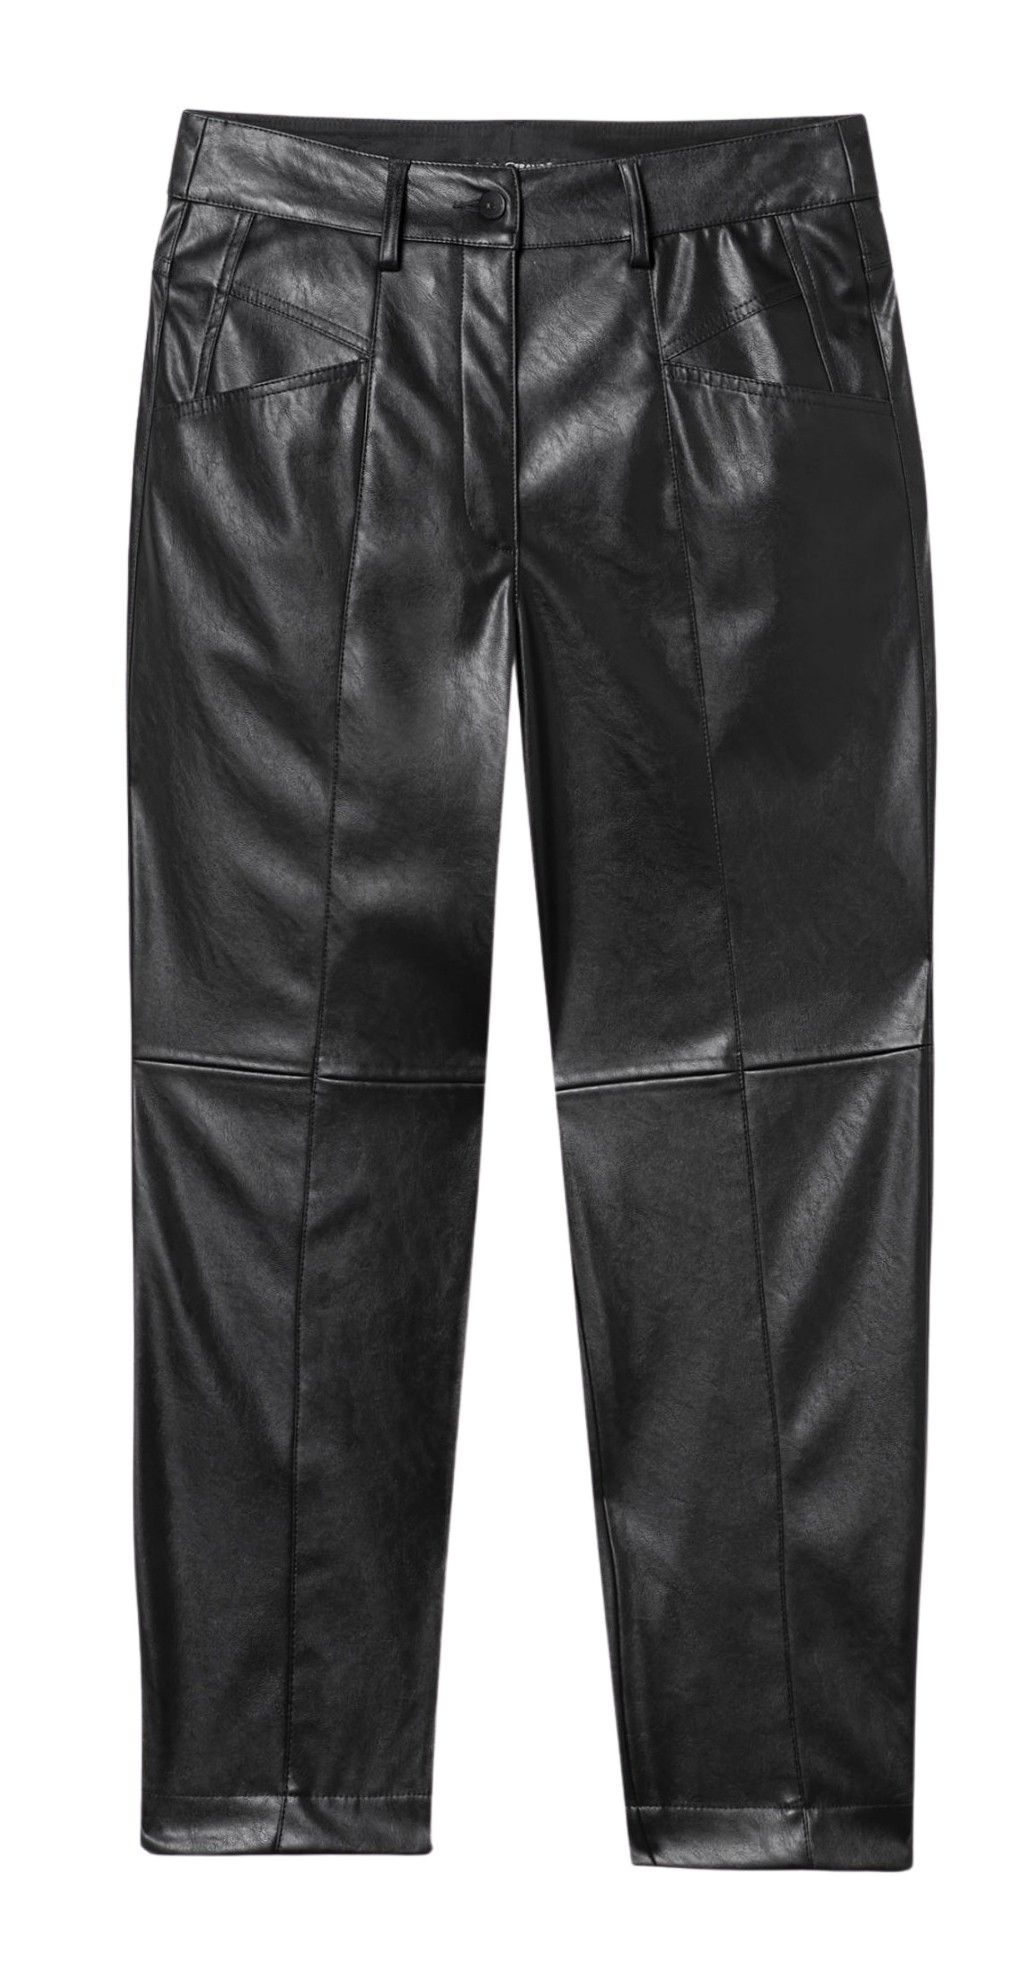 LUISA CERANO - Damen Hose - Tapered in Fake-Leather-Black